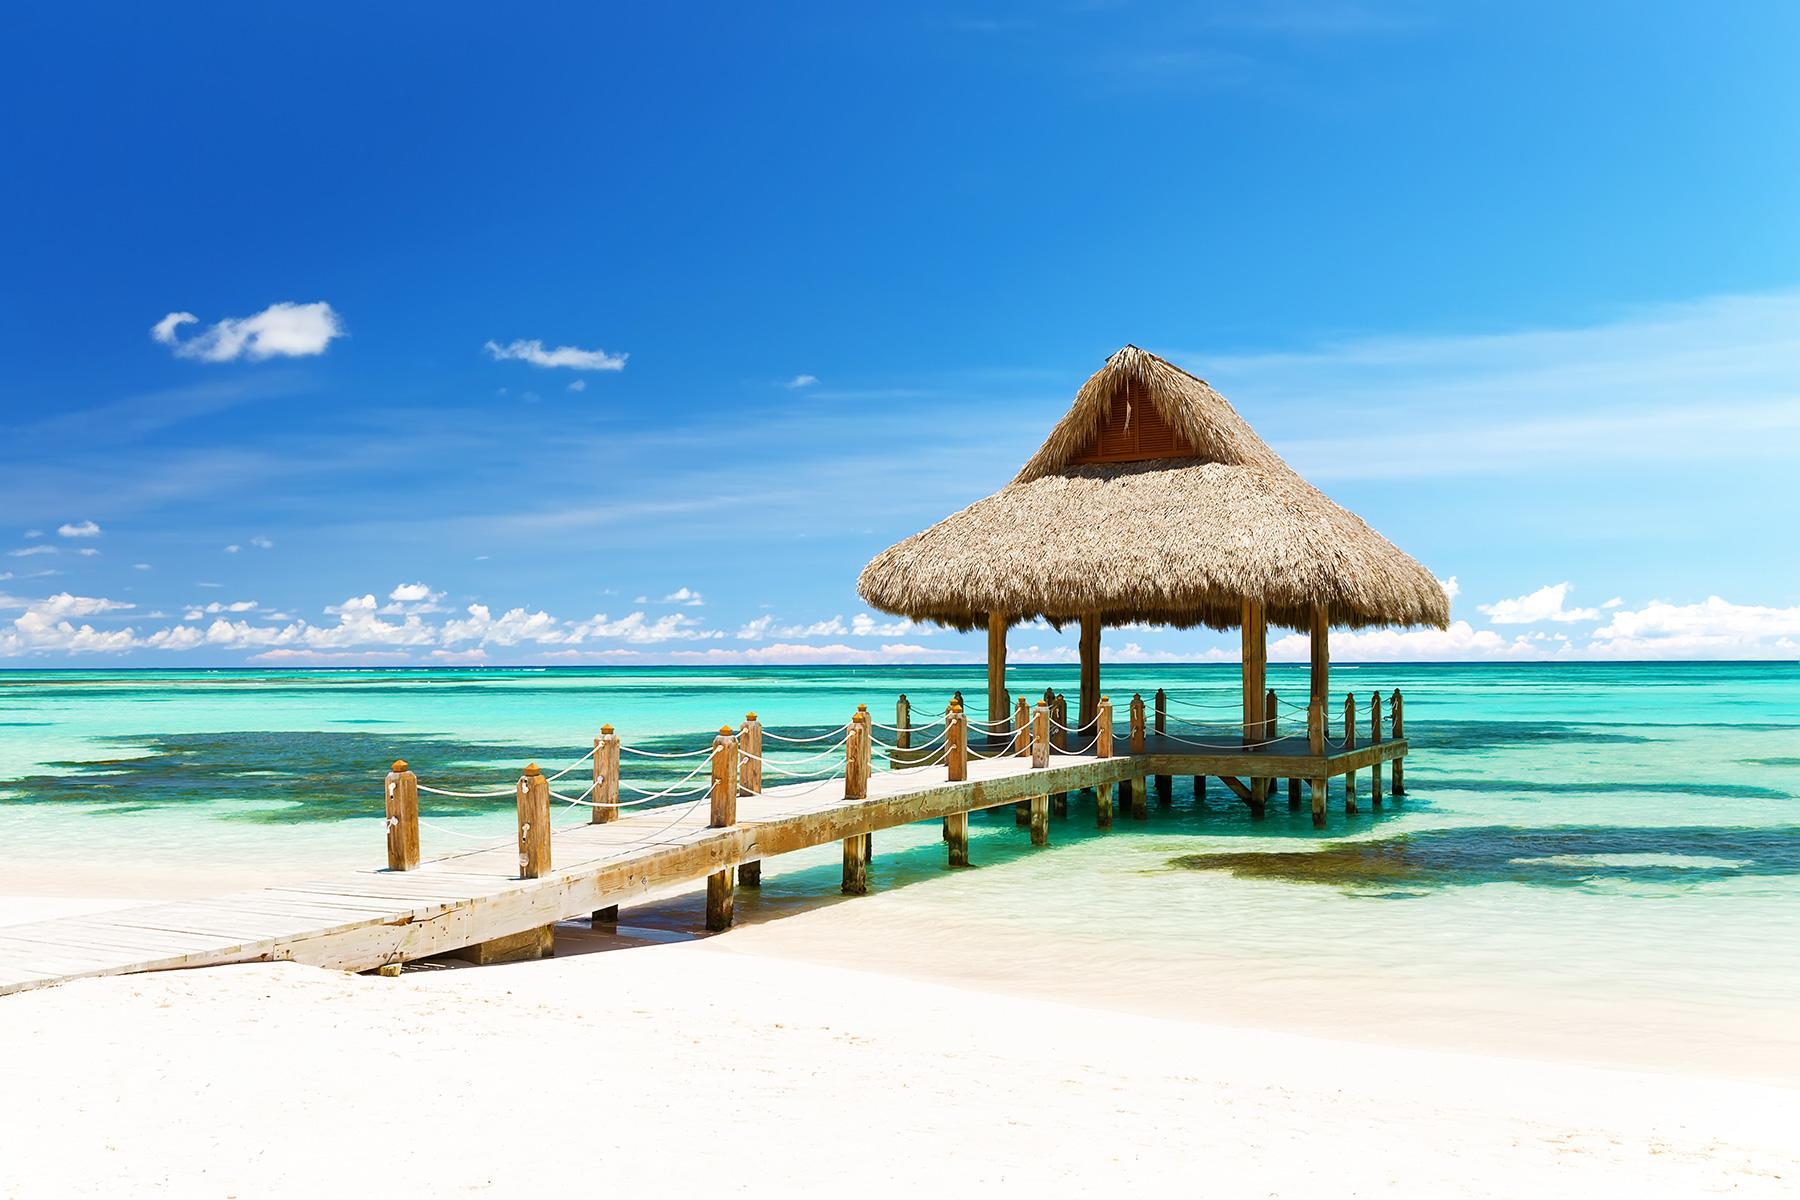 13_15BeachDestinationsforWinterGetaway__Punta Cana, Dominican Republic_PuntaCana_shutterstock_557463445